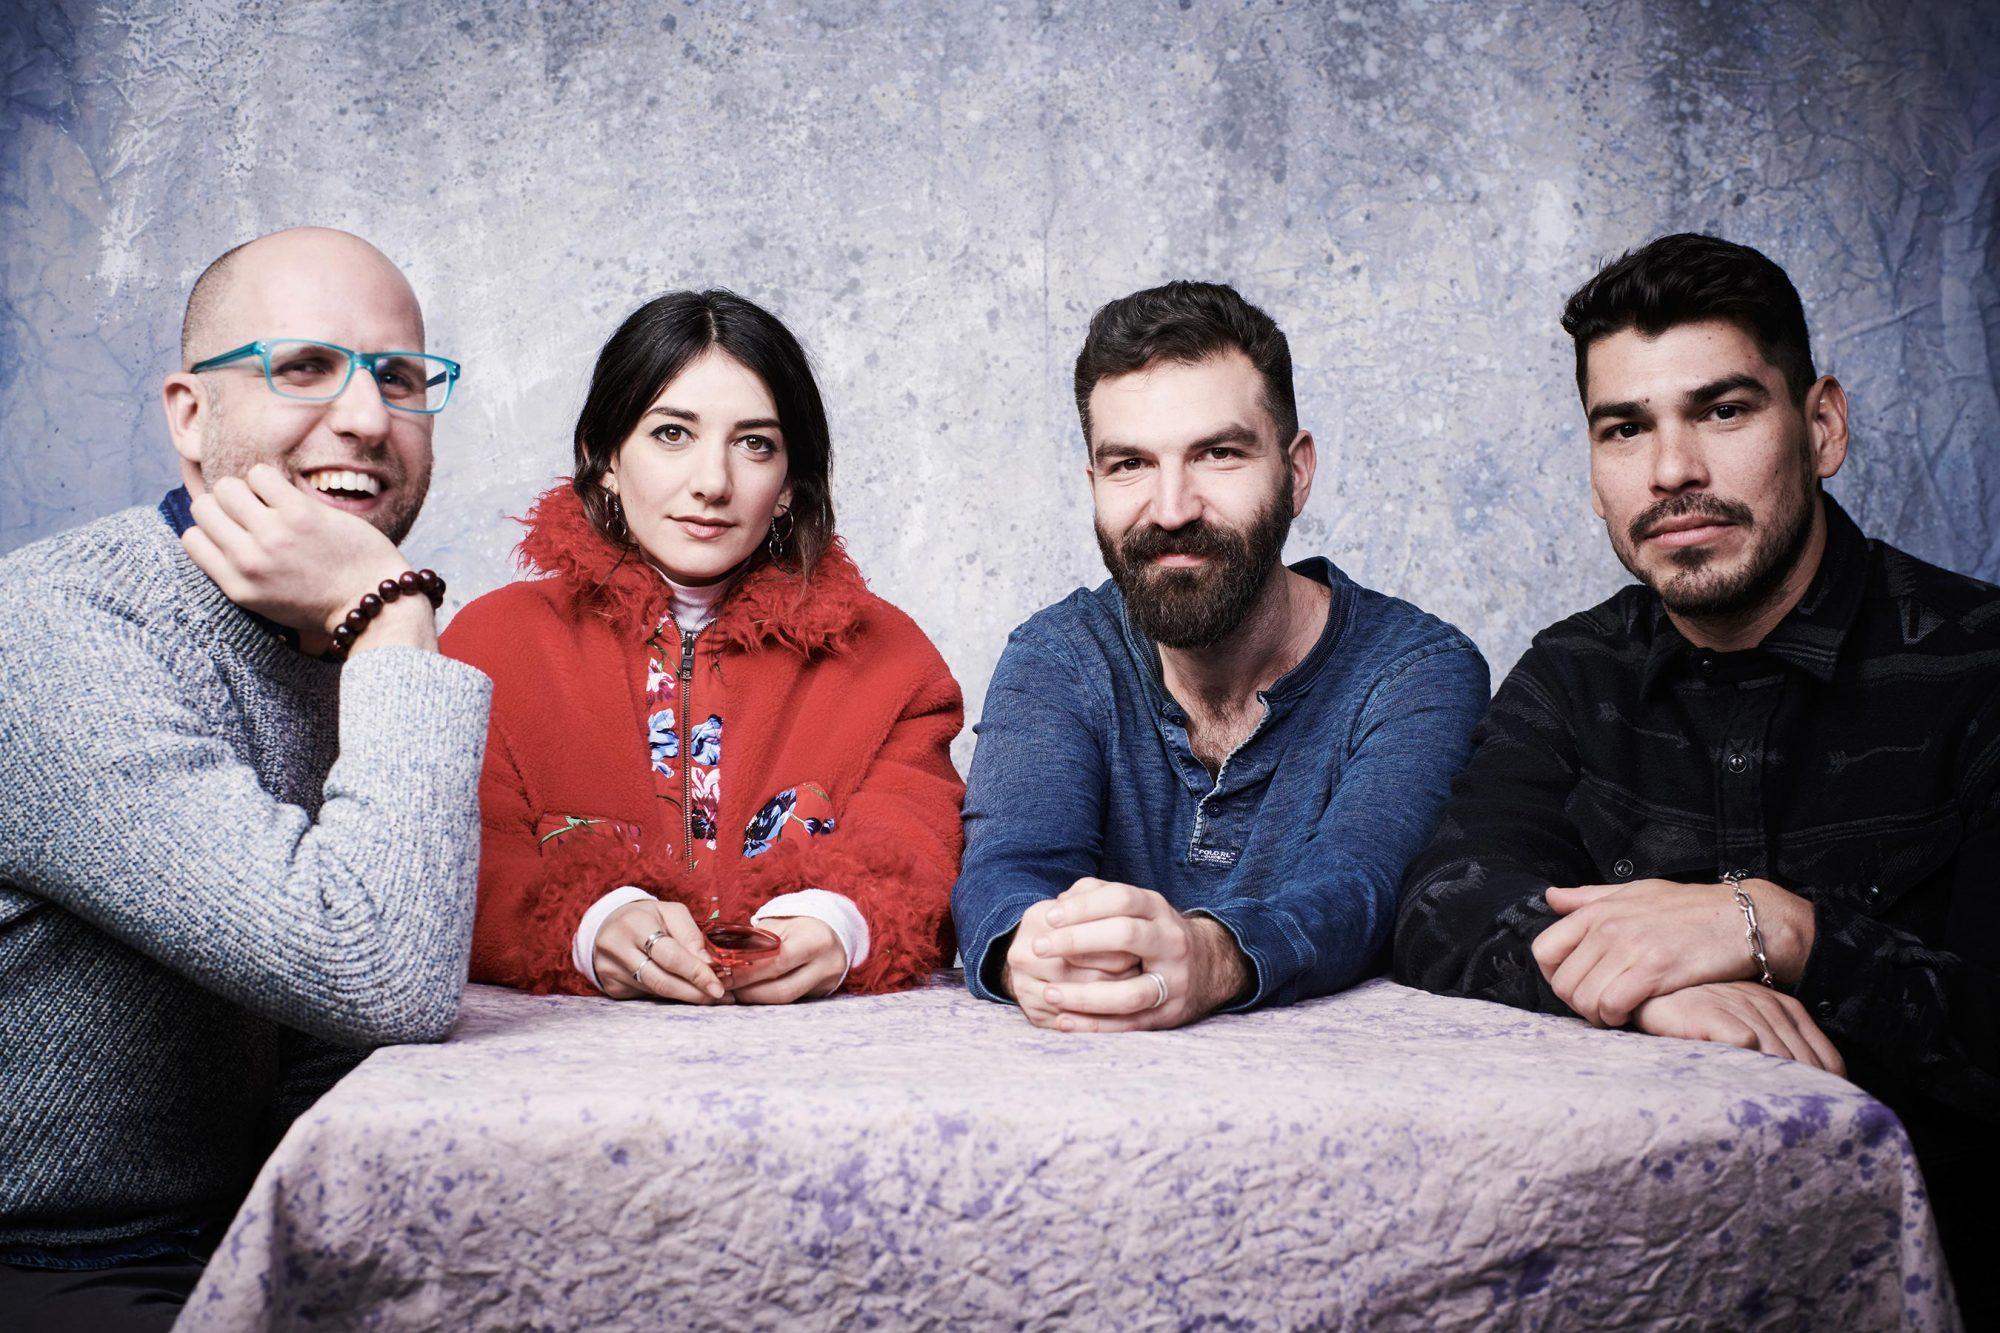 Deadline Studio Portraits at Sundance, Day 1, Park City, USA - 19 Jan 2018